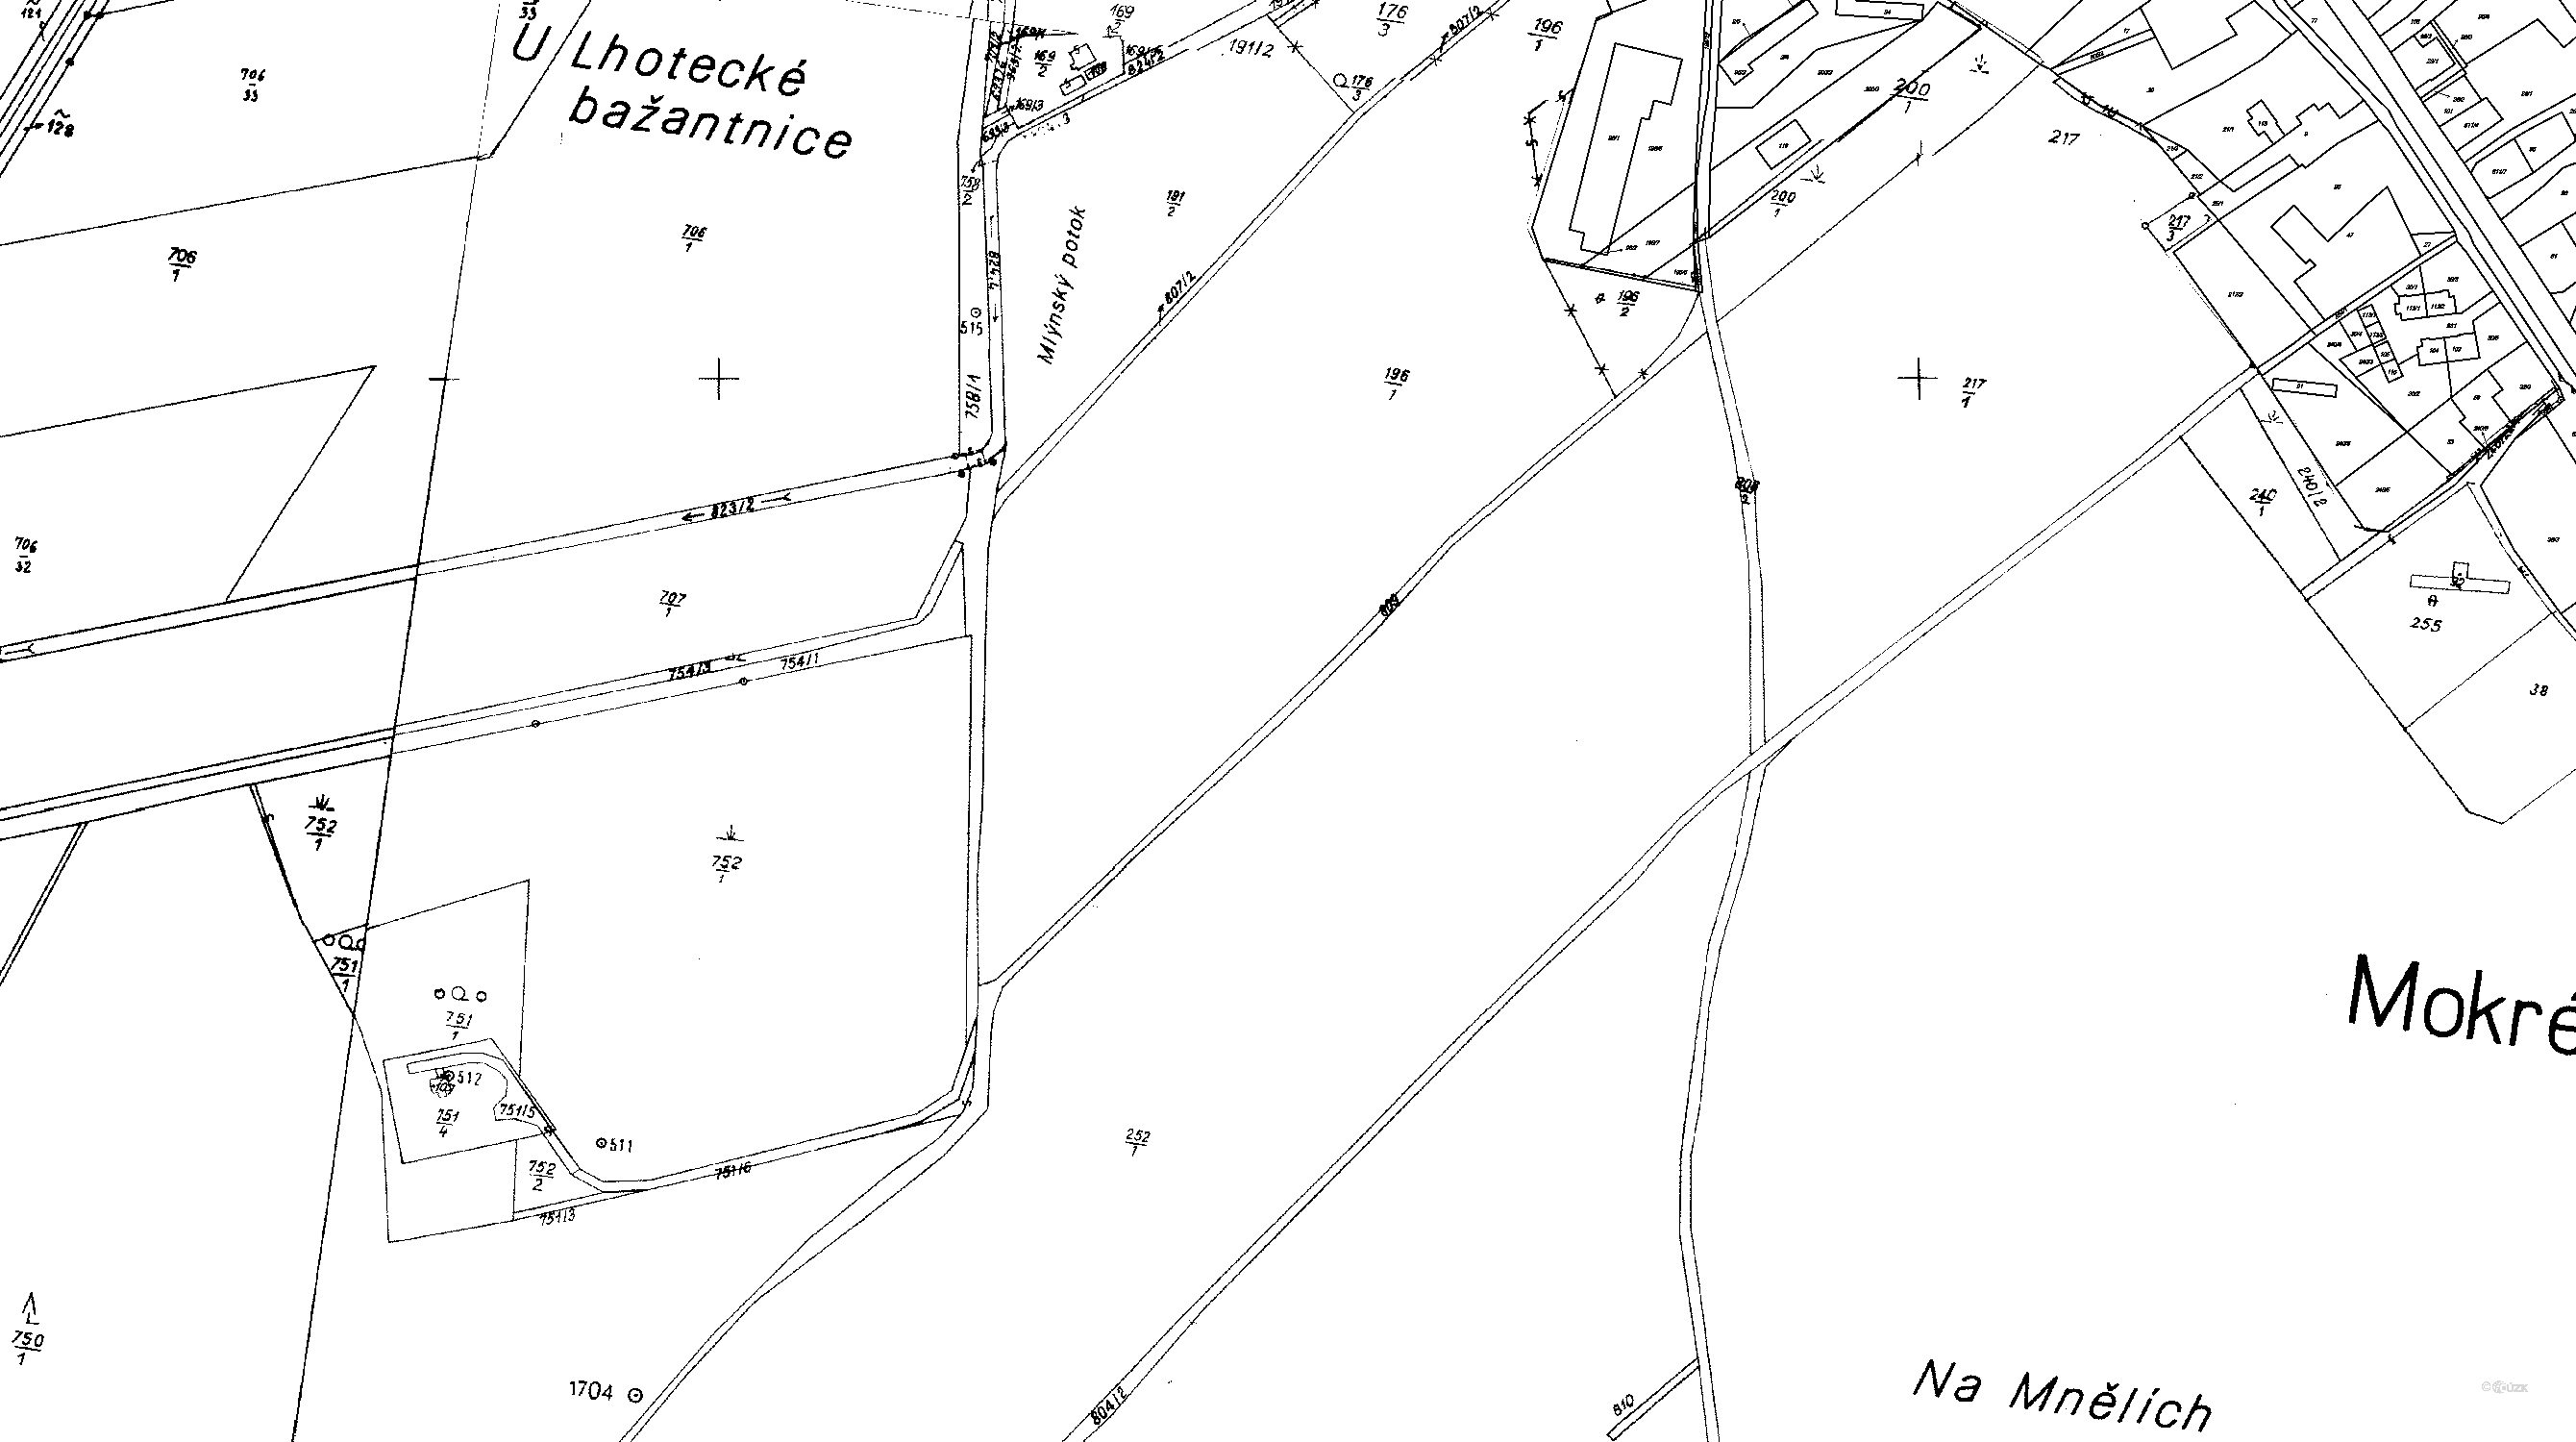 Porno videa zdarma z karikatur